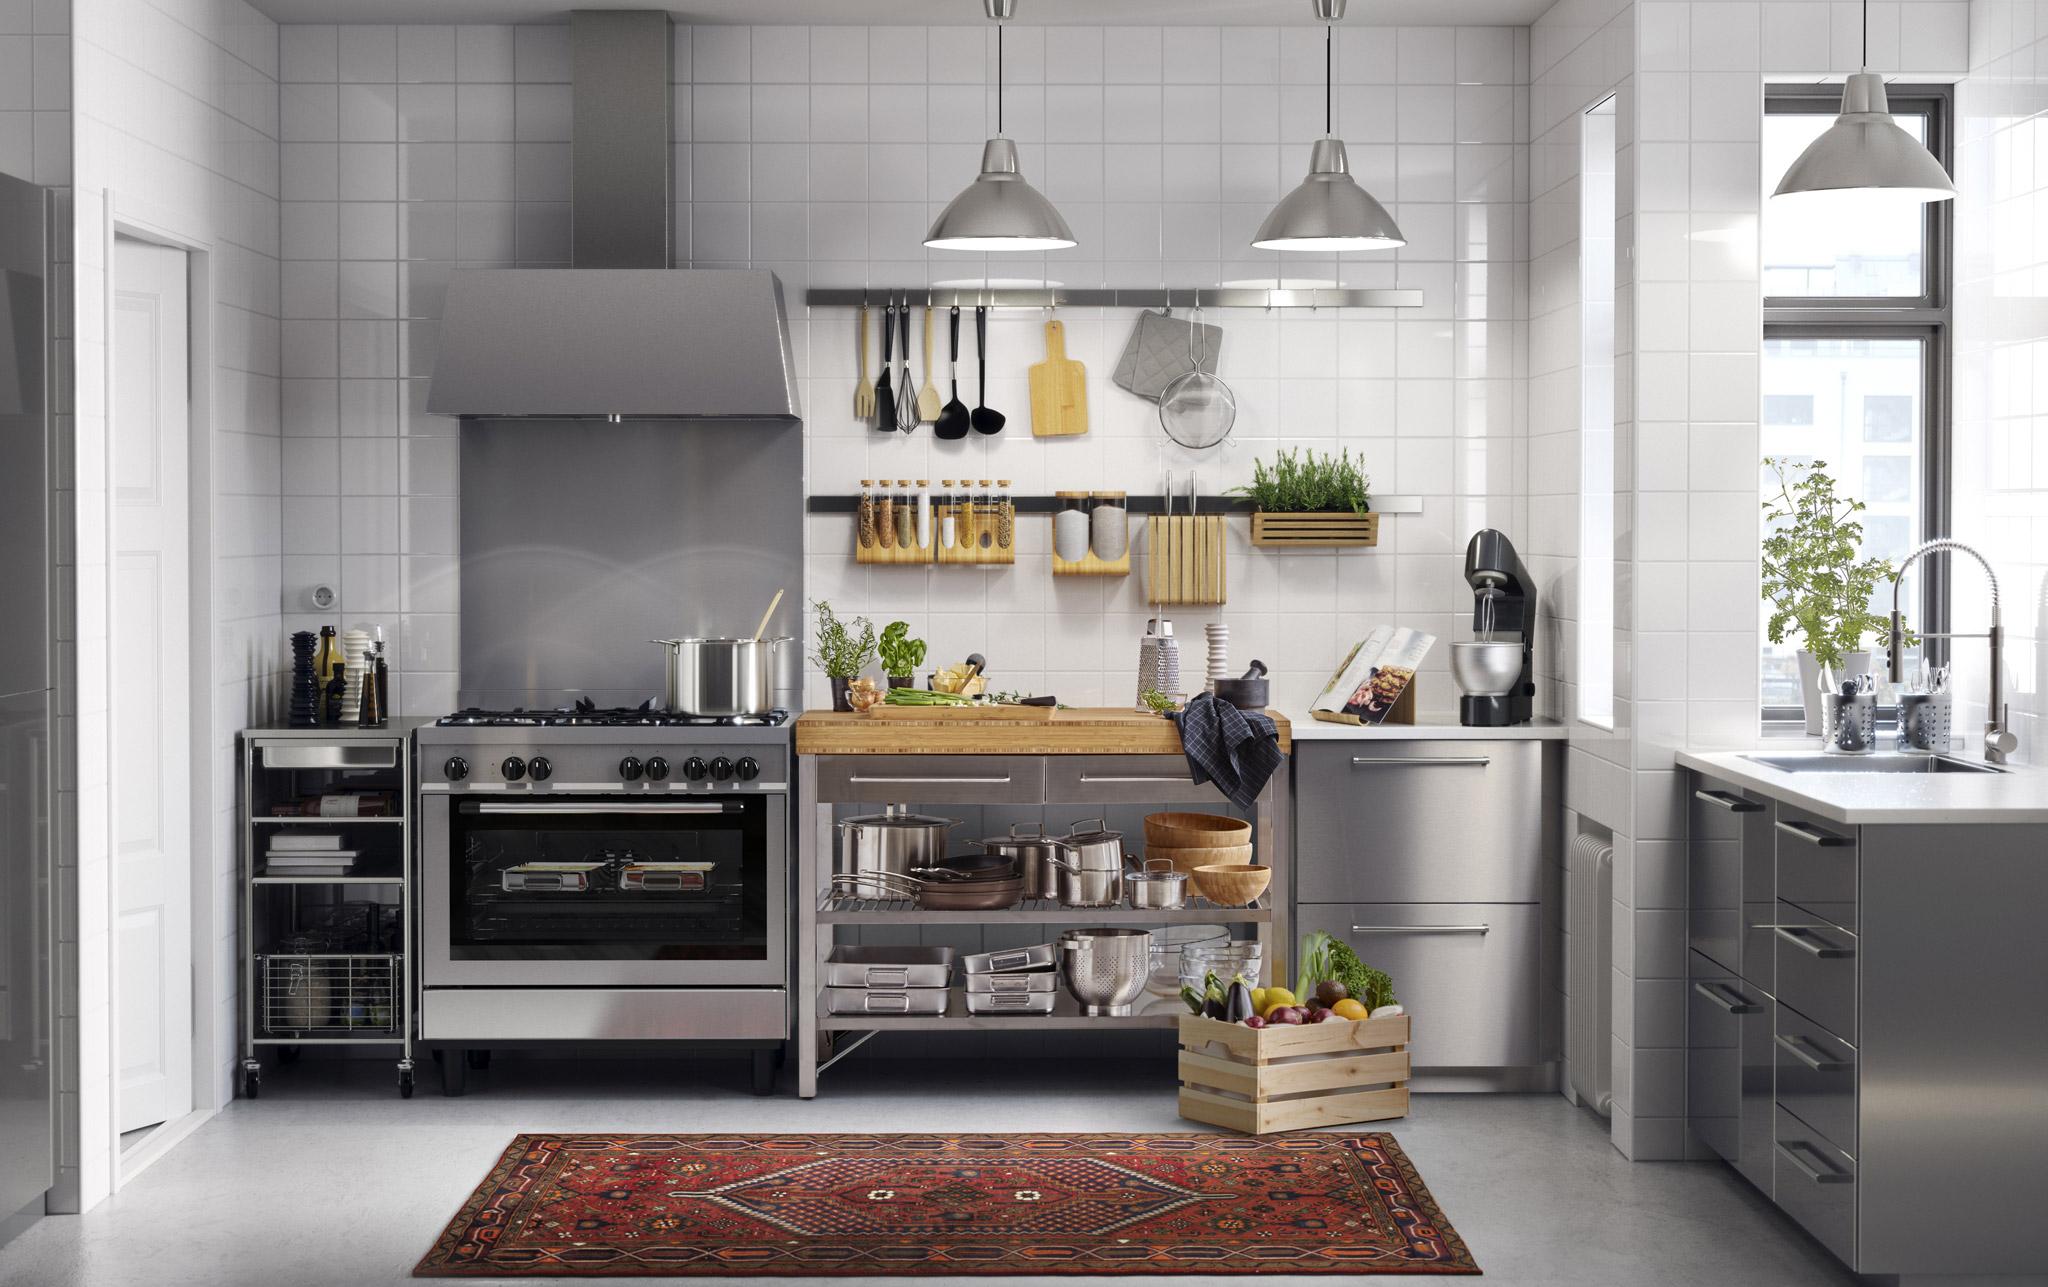 Binario Pensili Cucina Ikea ikea cucina: soluzioni creative e funzionali | diredonna